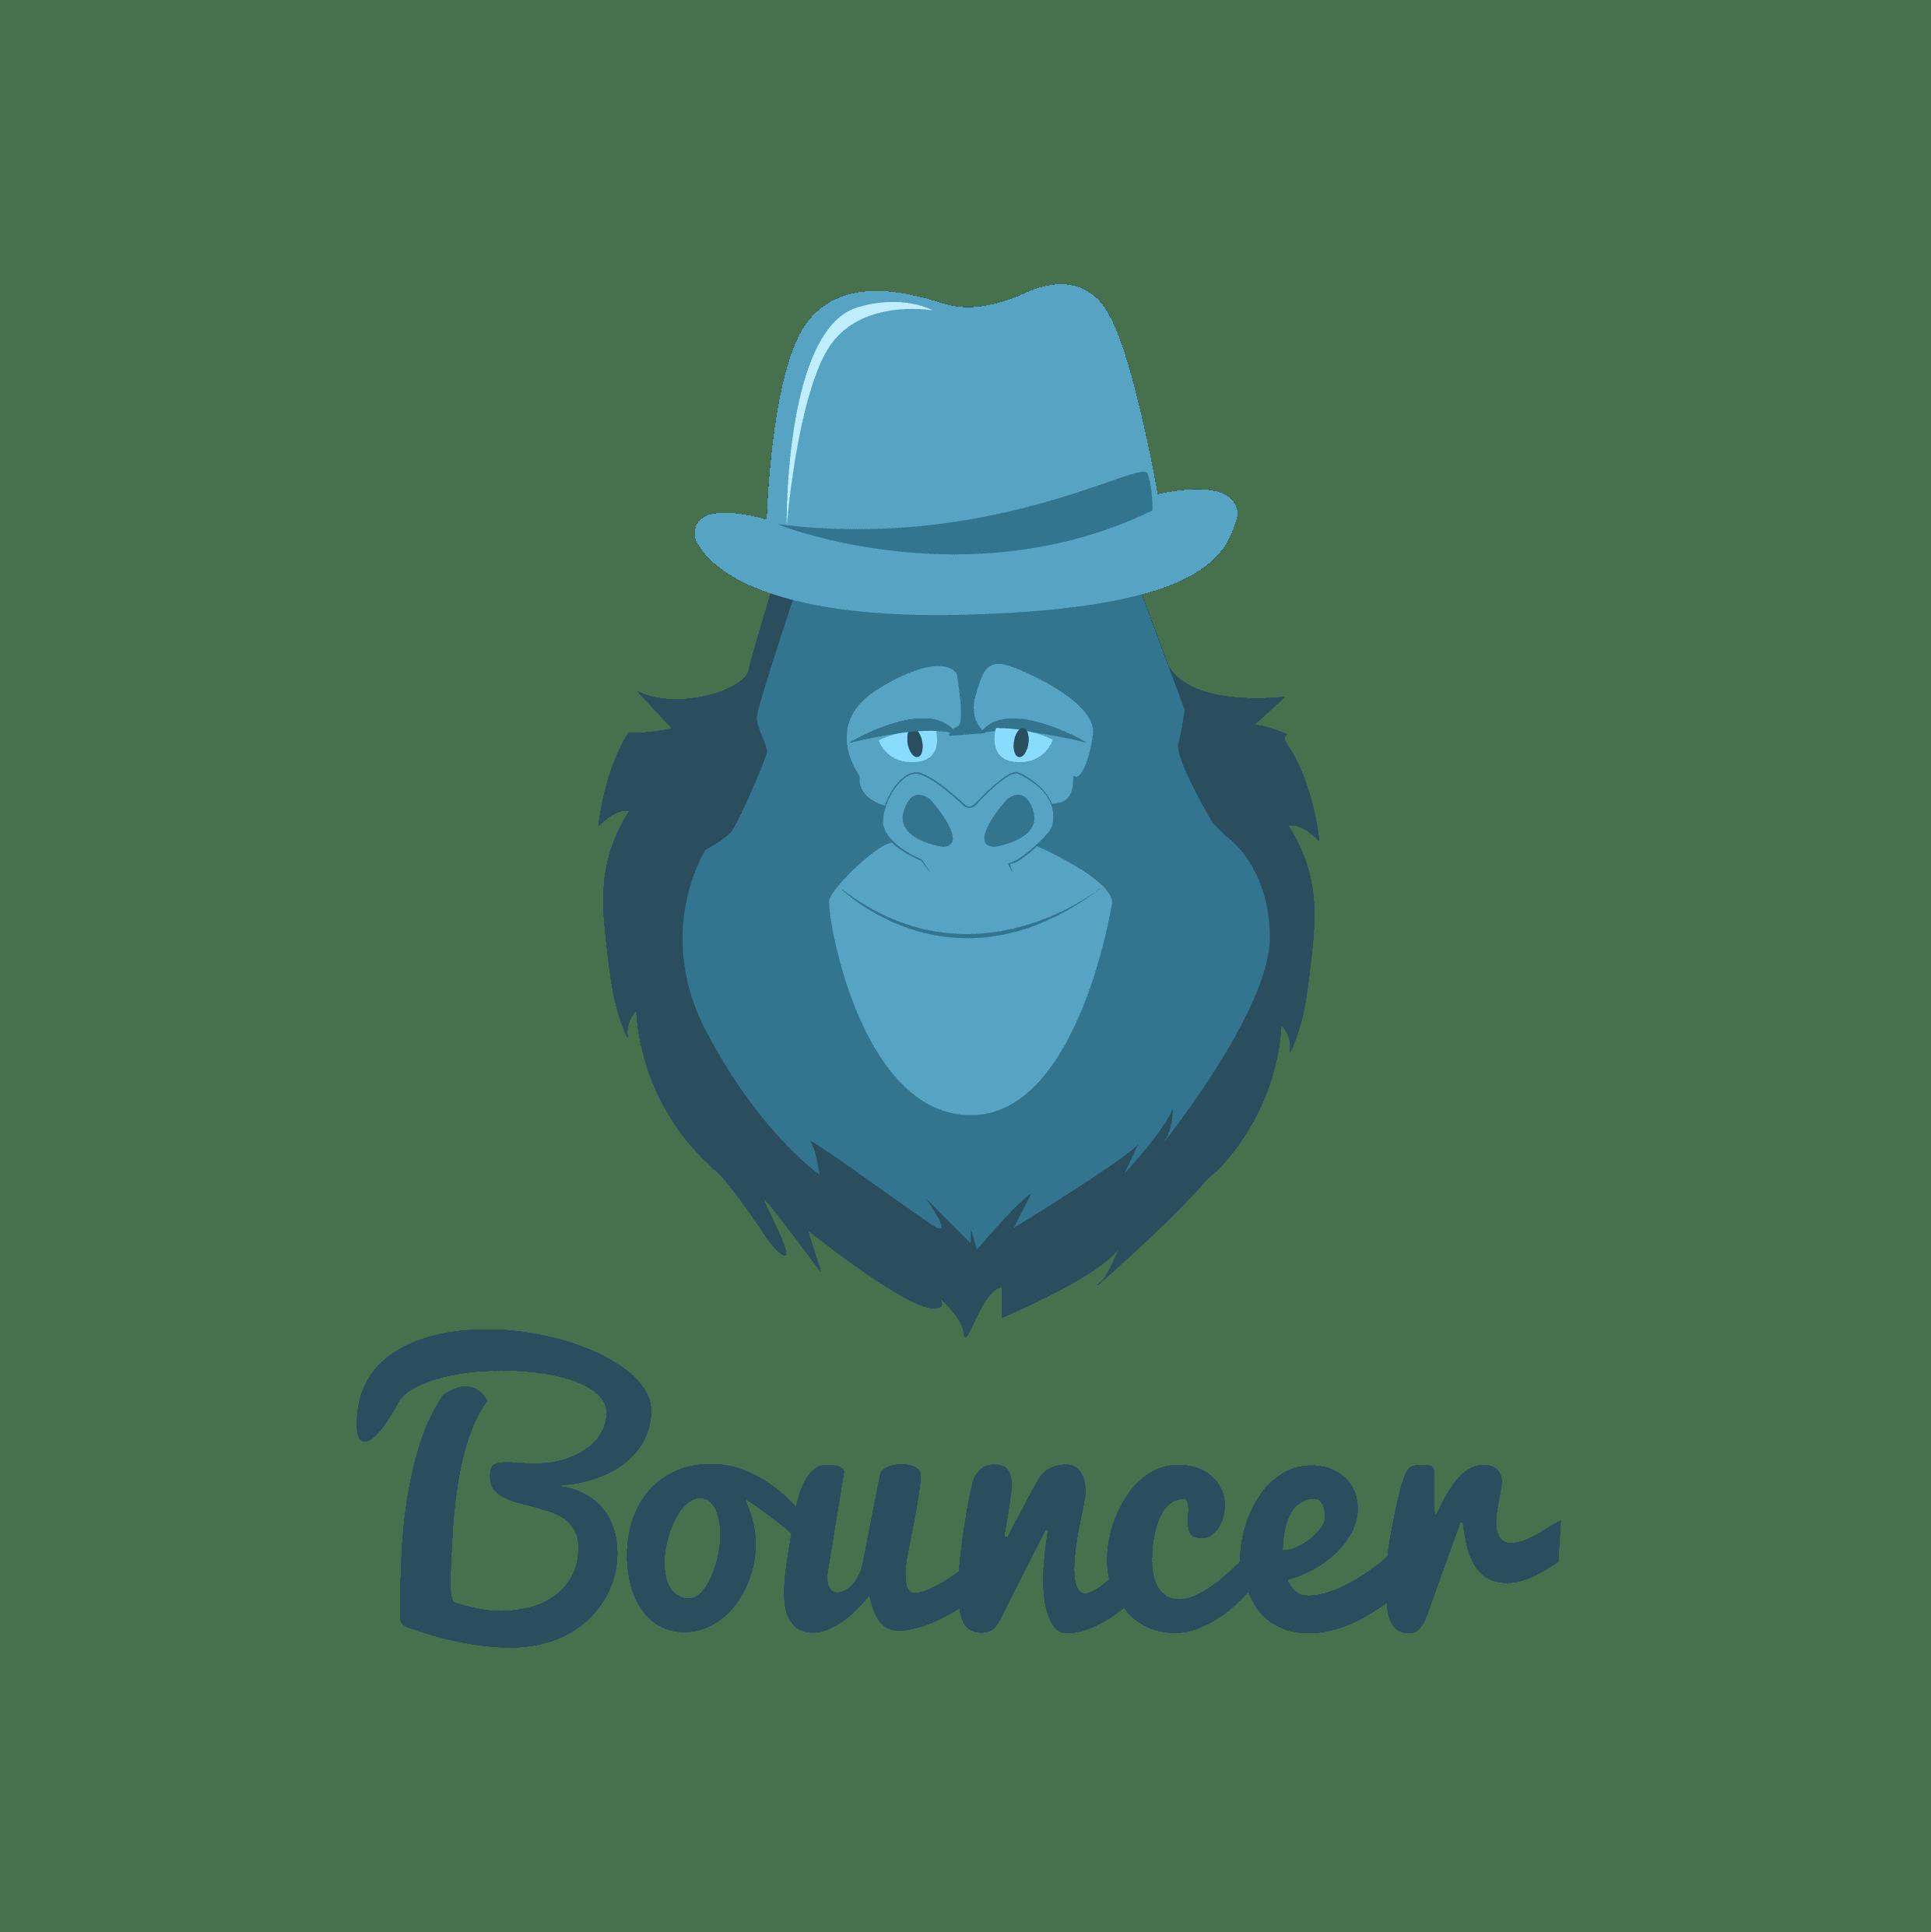 Bouncer Coupon & Startup Discount